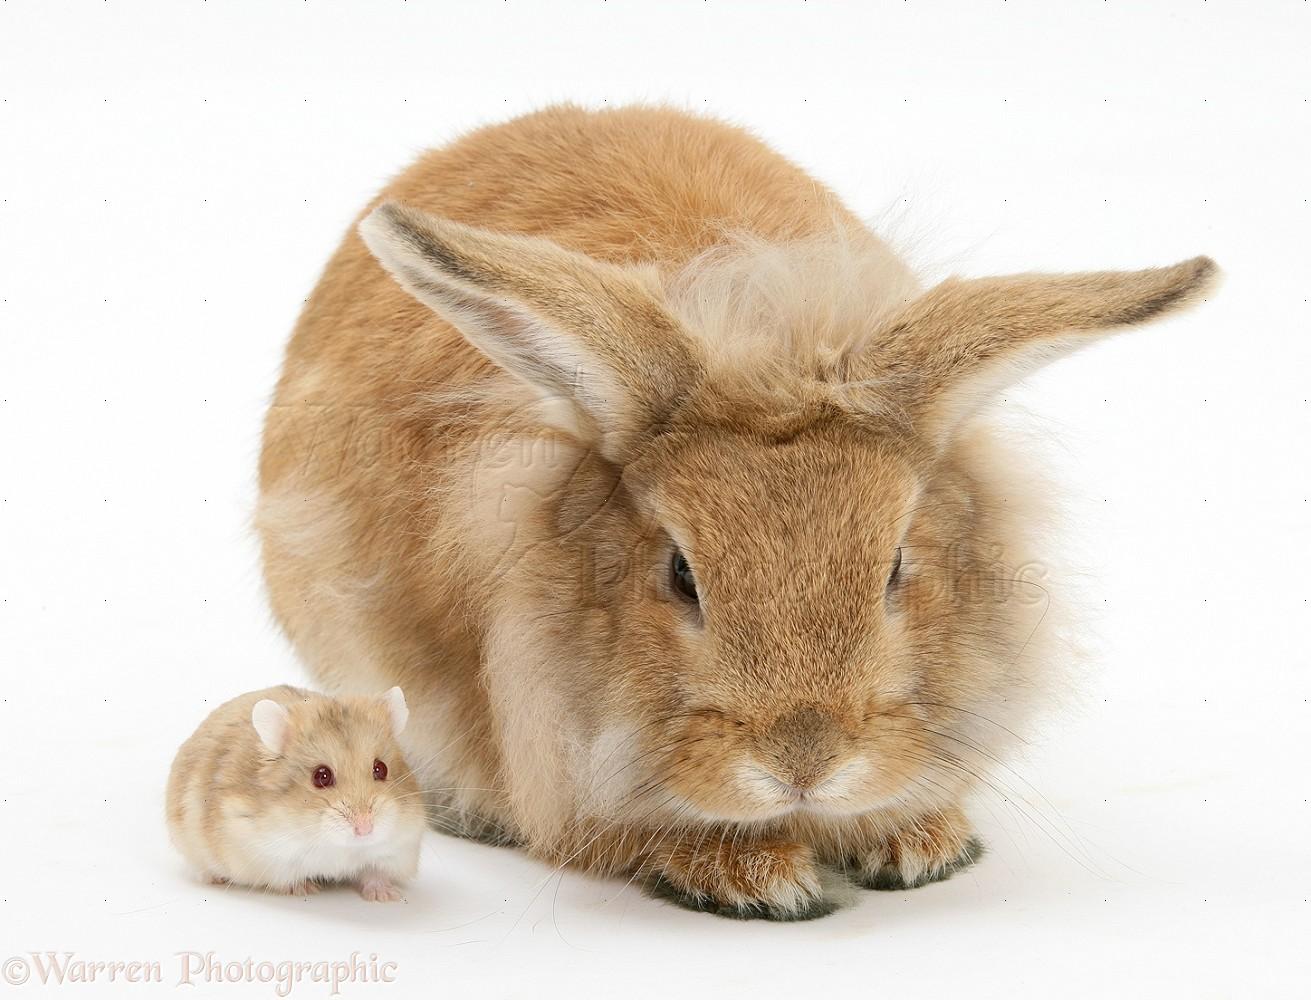 WP18866 Sandy Lionhead rabbit meeting Dwarf Siberian Hamster.